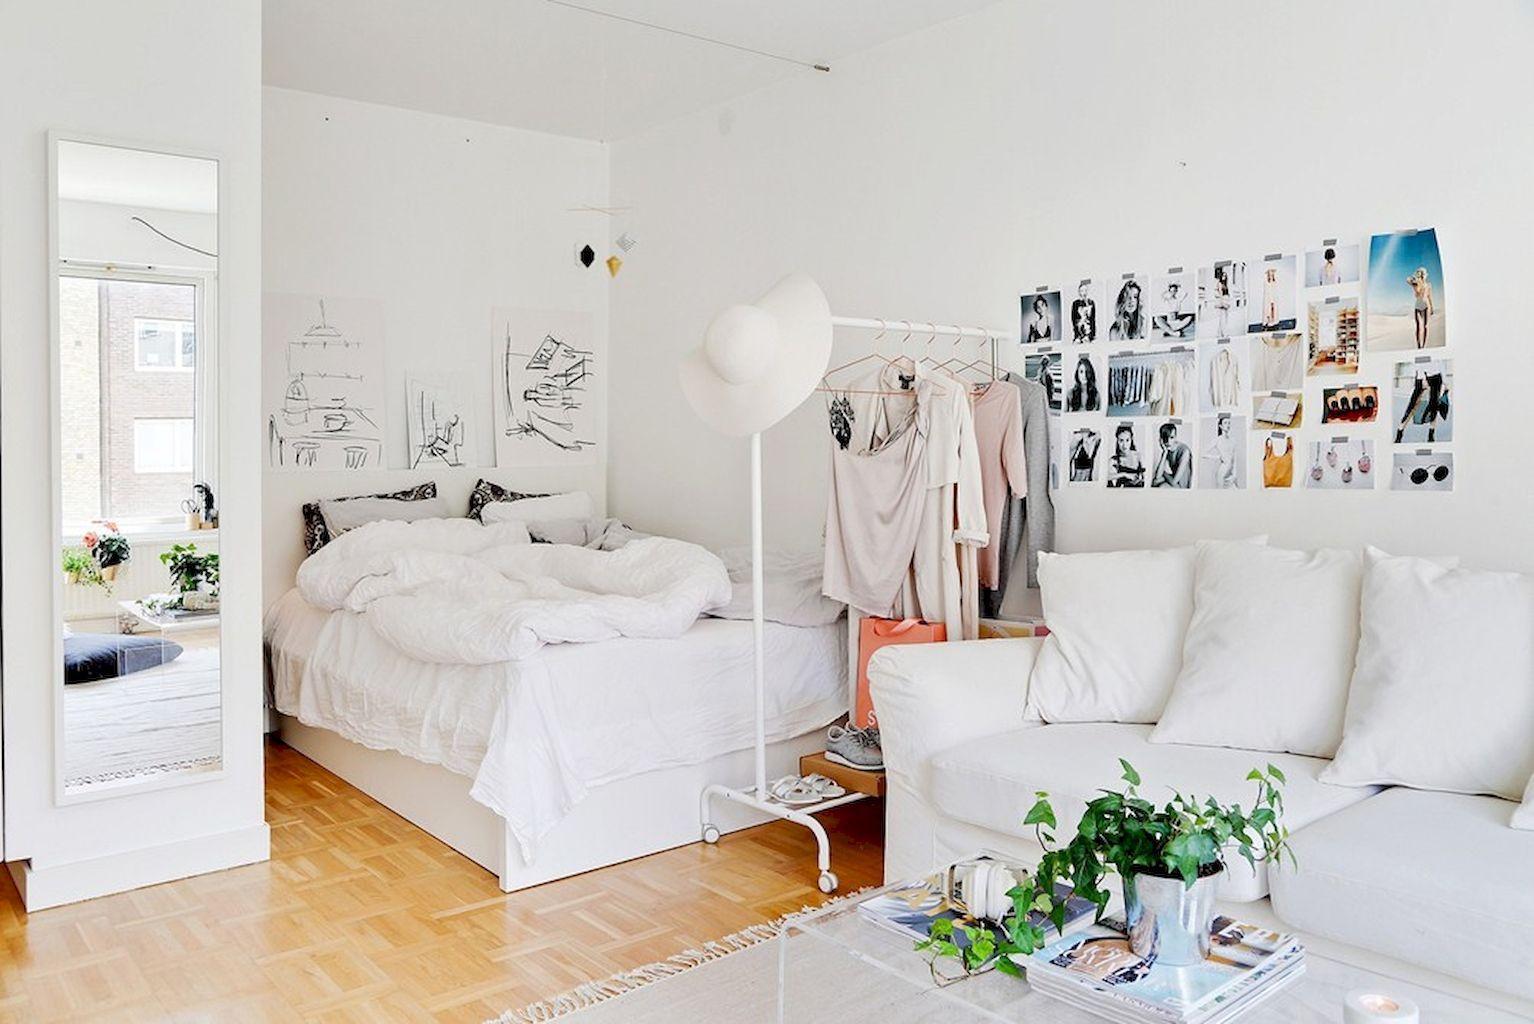 77 magnificent small studio apartment decor ideas 25 in 2019 my rh pinterest com